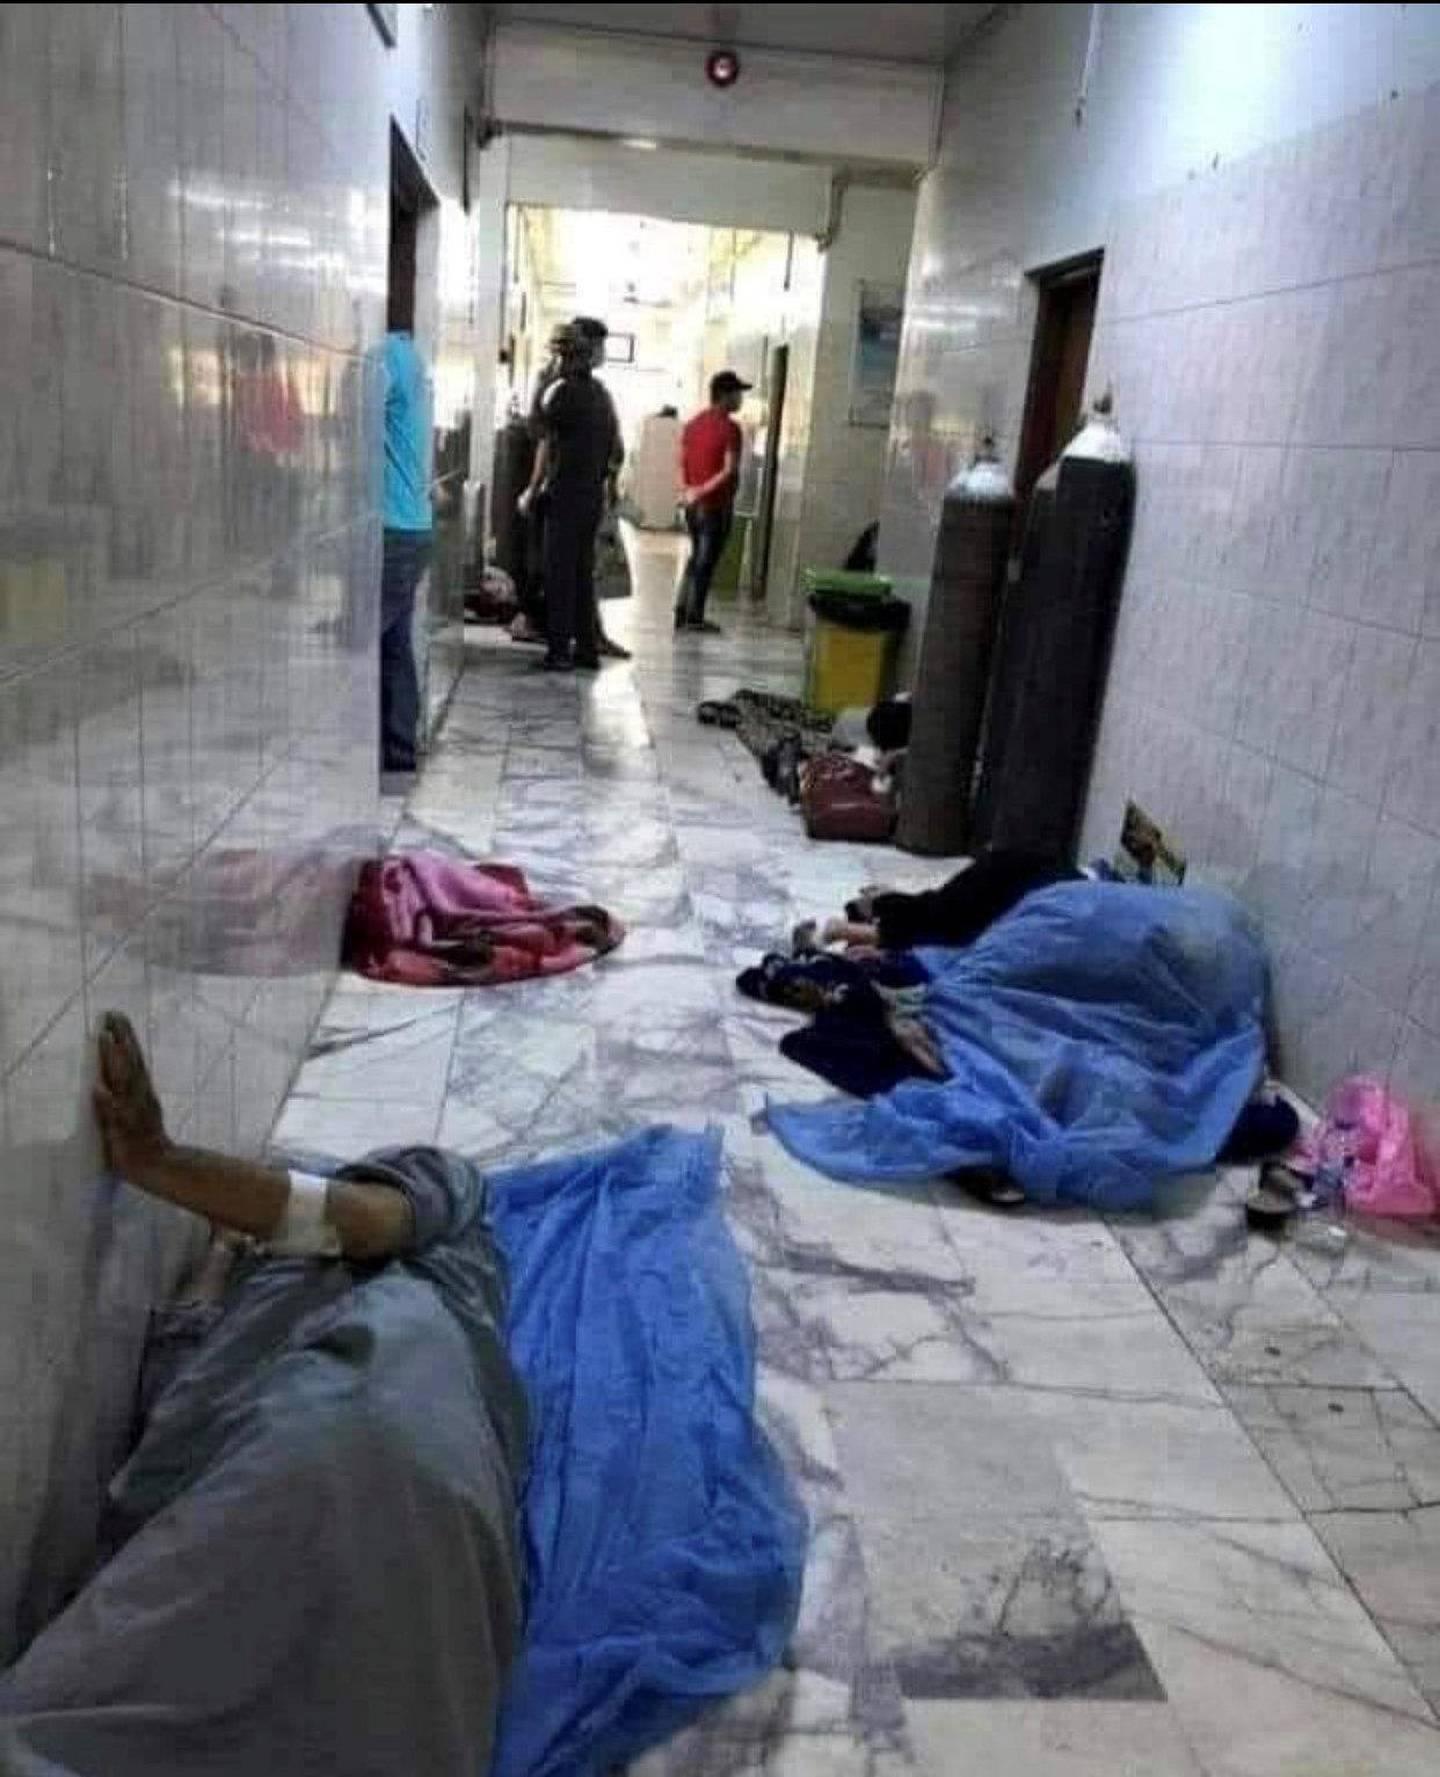 hospital in Mosul